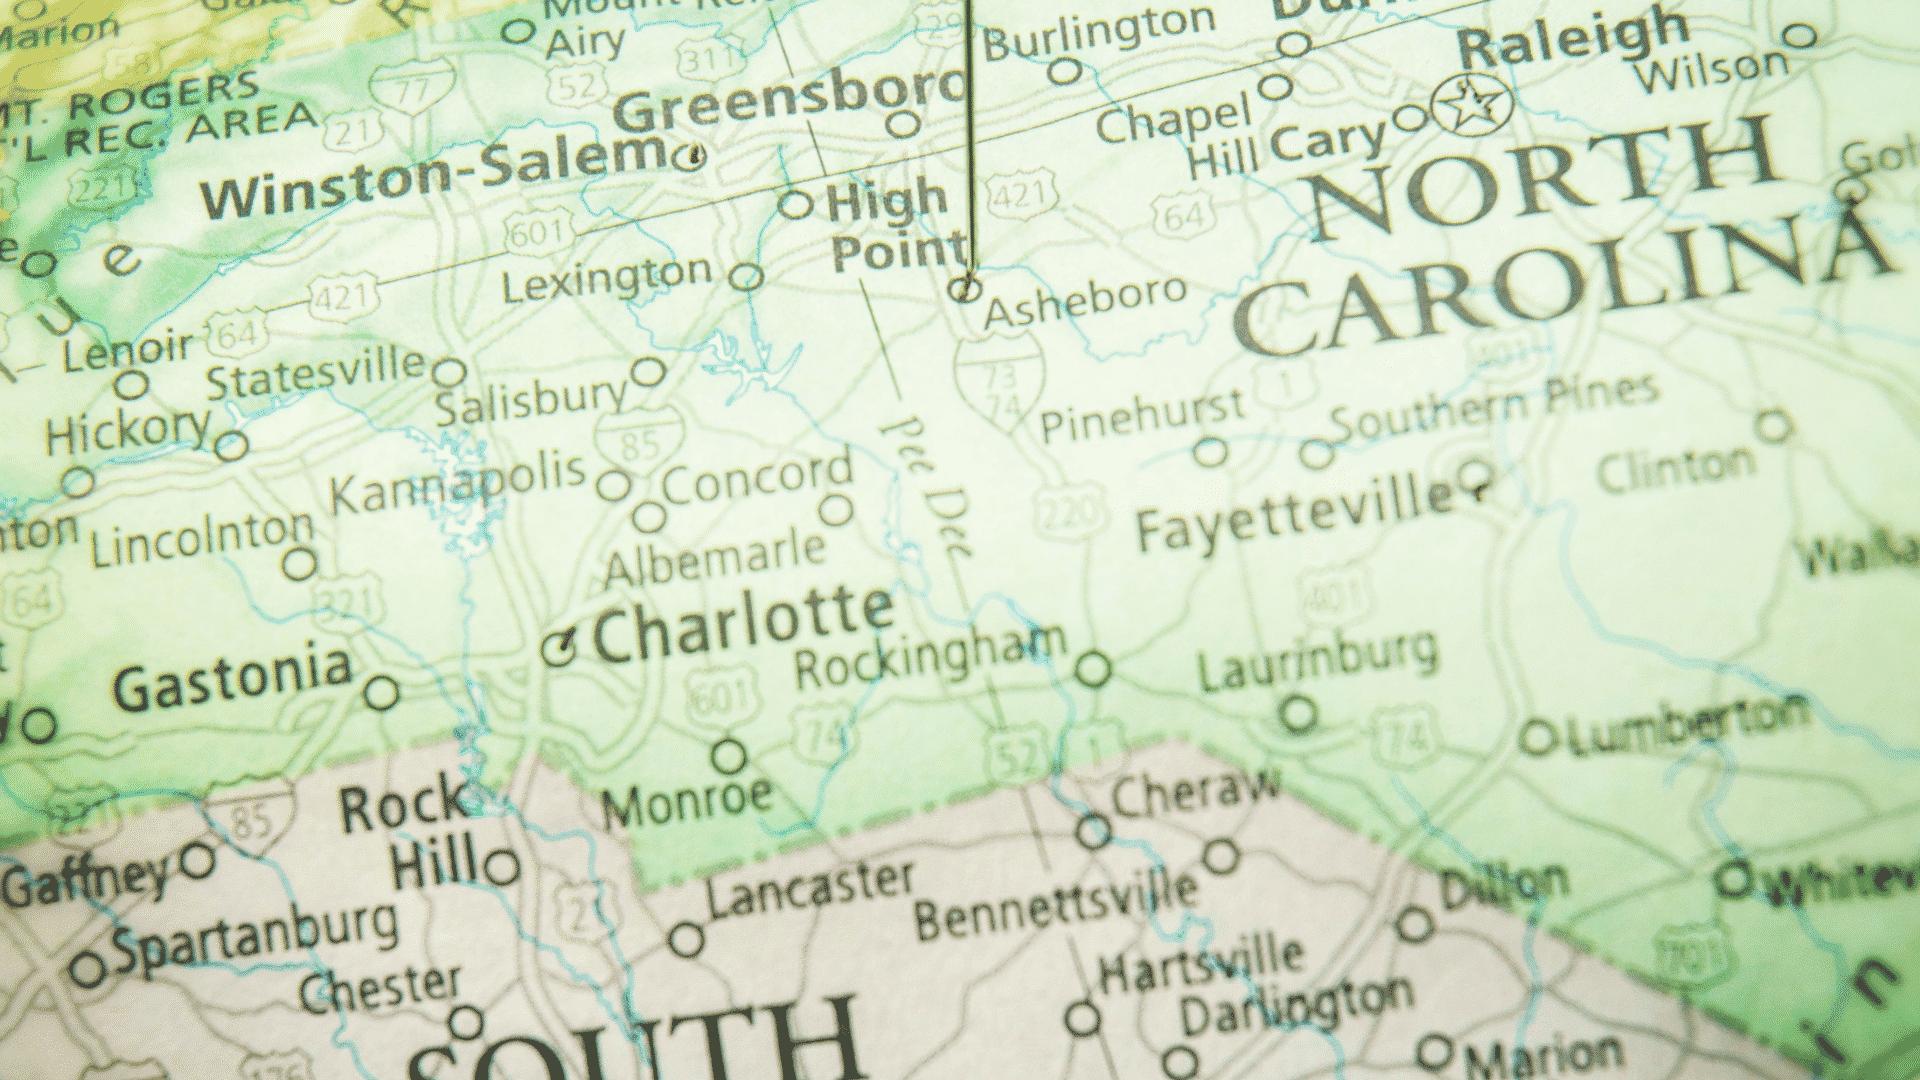 High Point North Carolina on Map